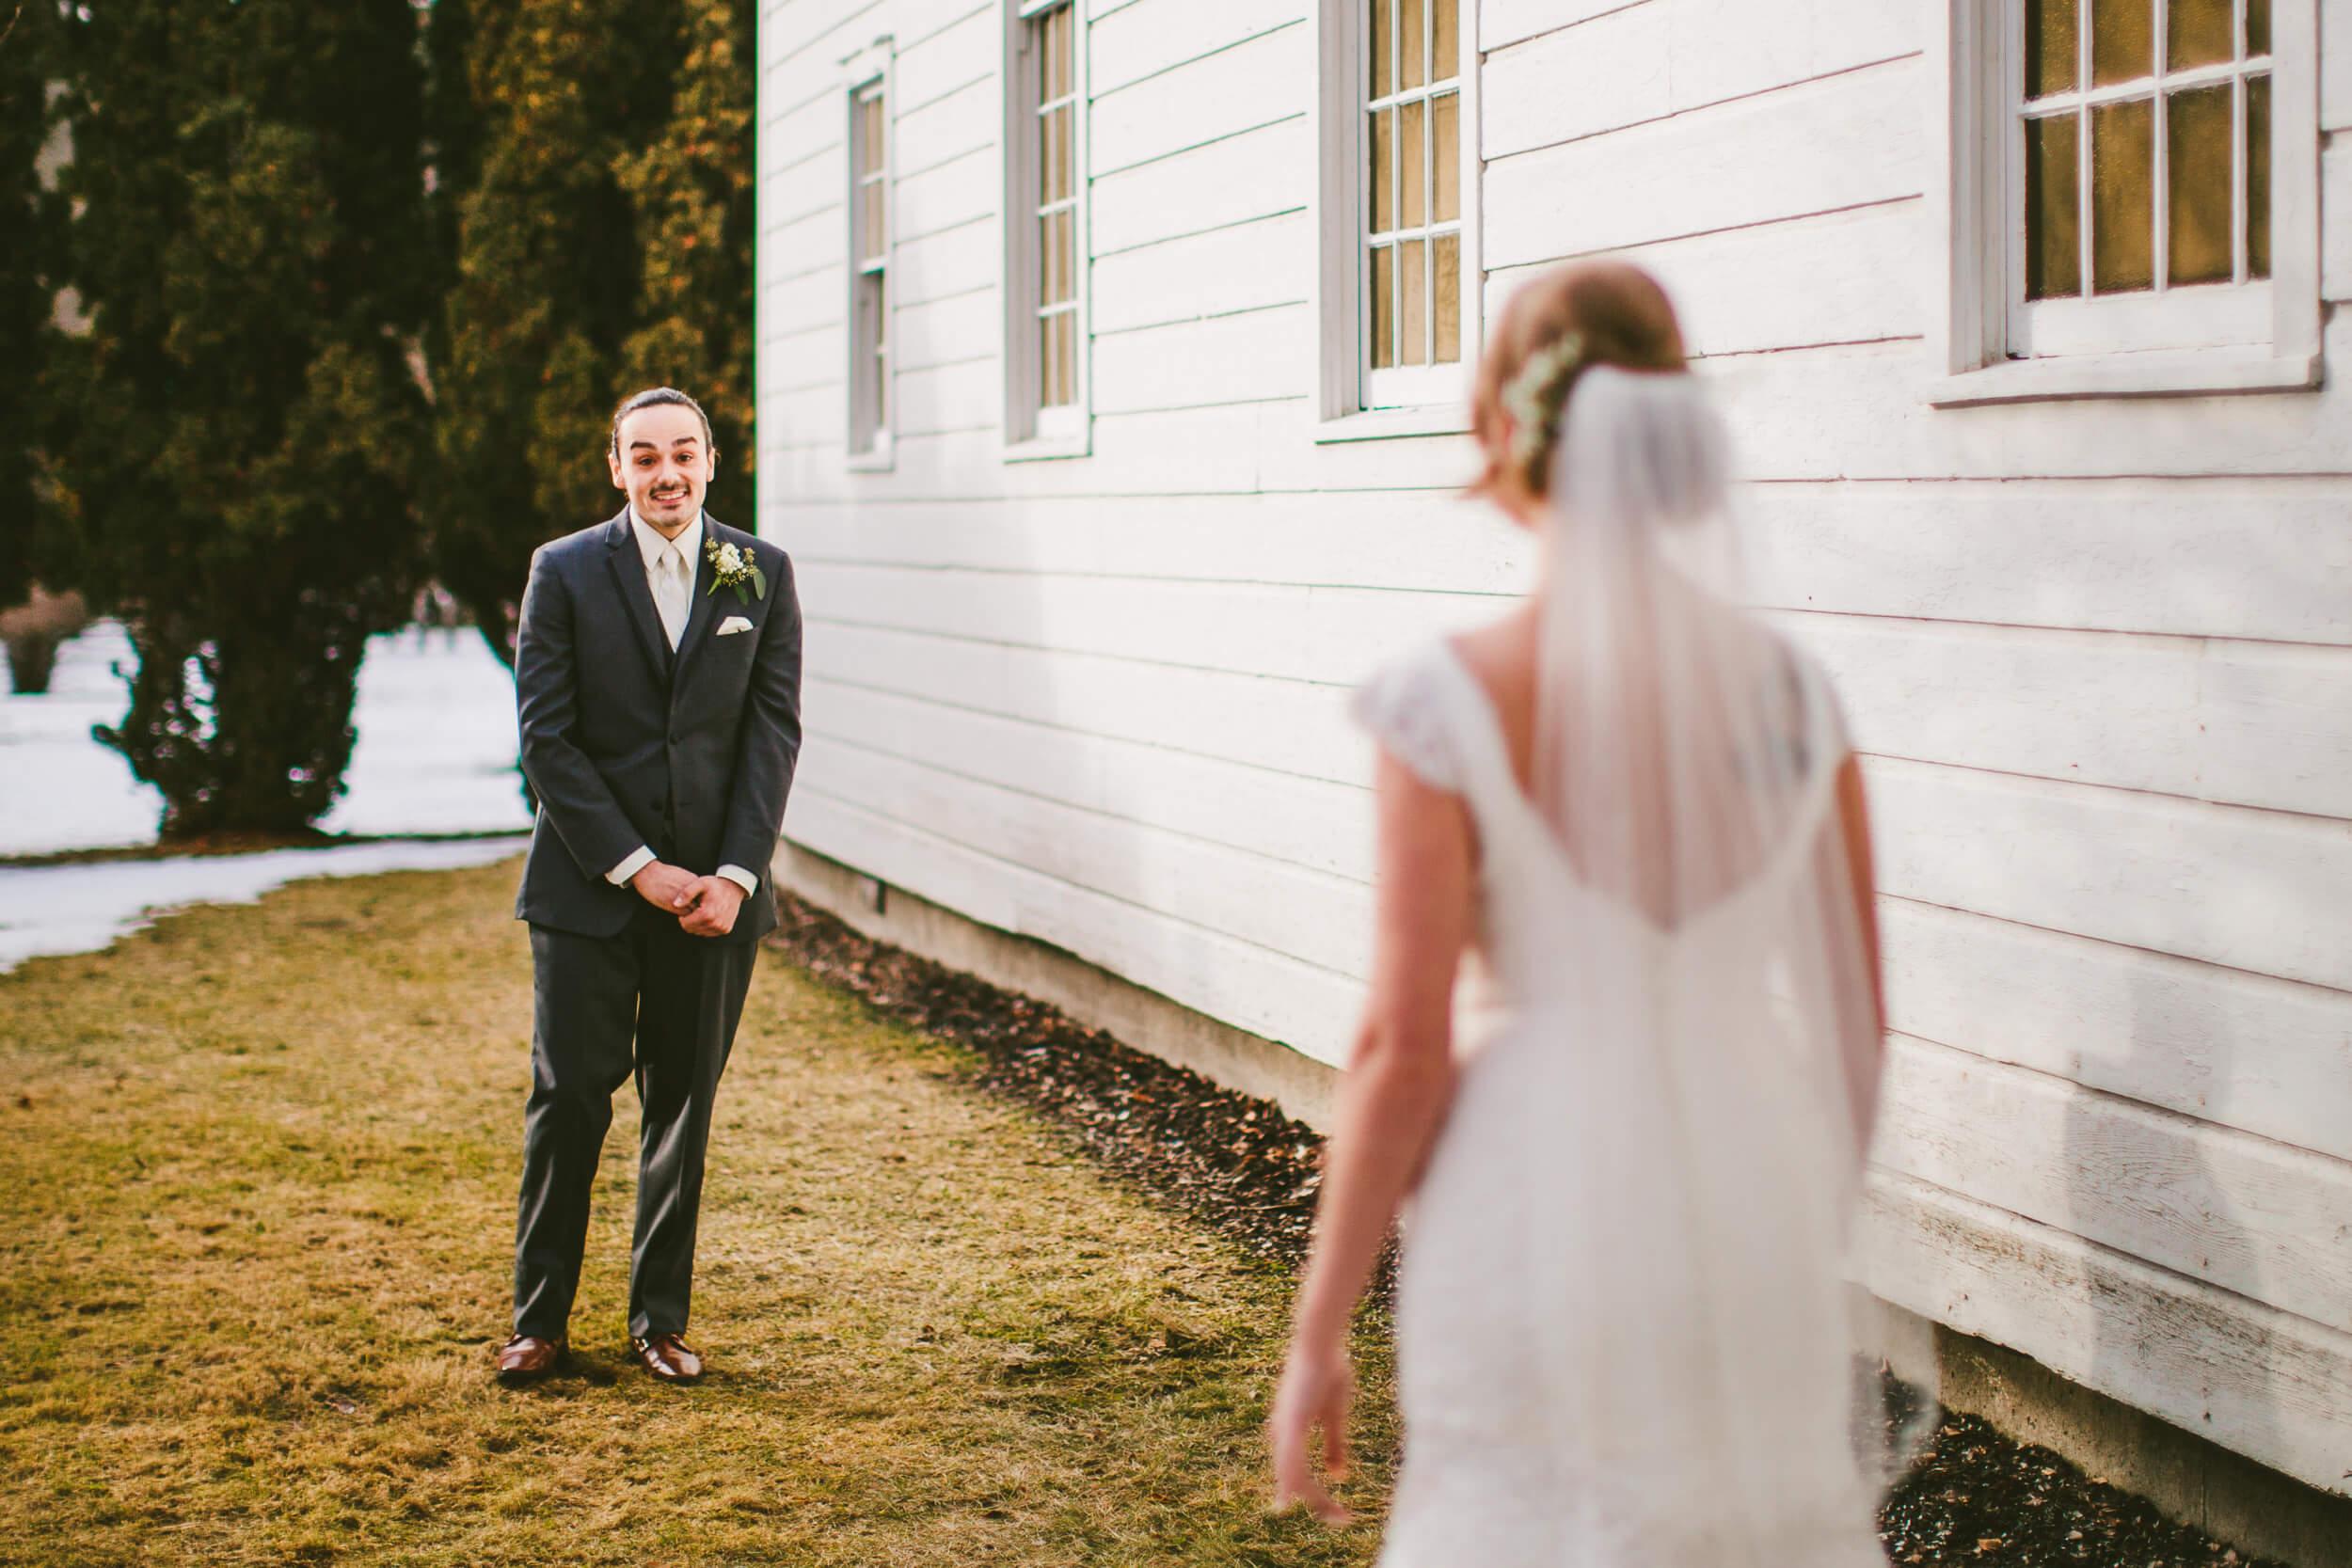 mukogawa winter wedding in spokane (73).jpg